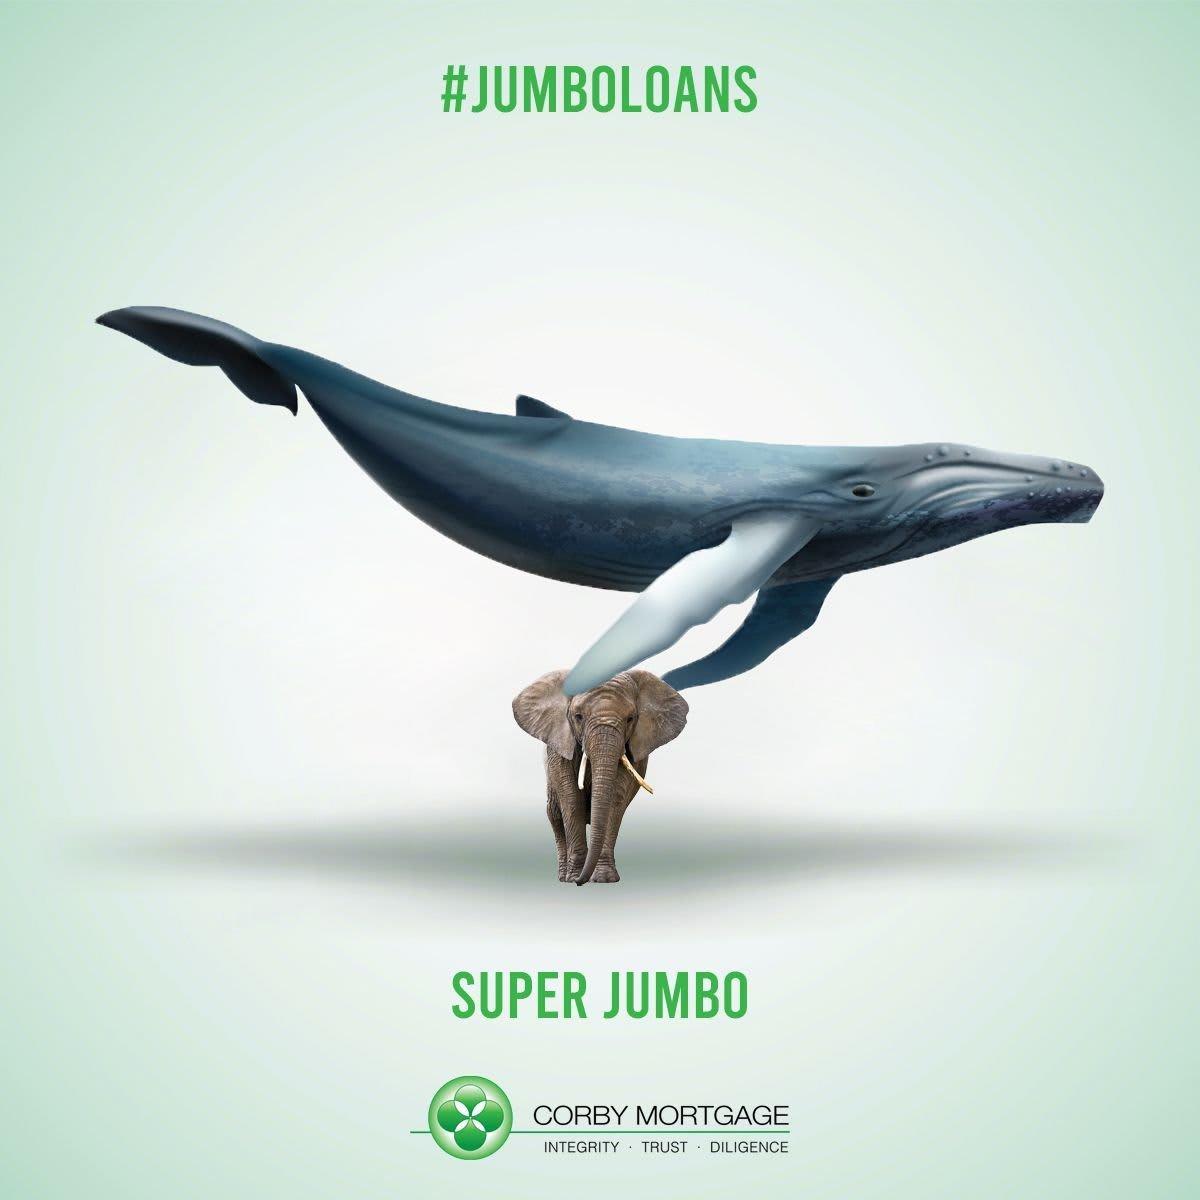 jumbo loan corby mortgage